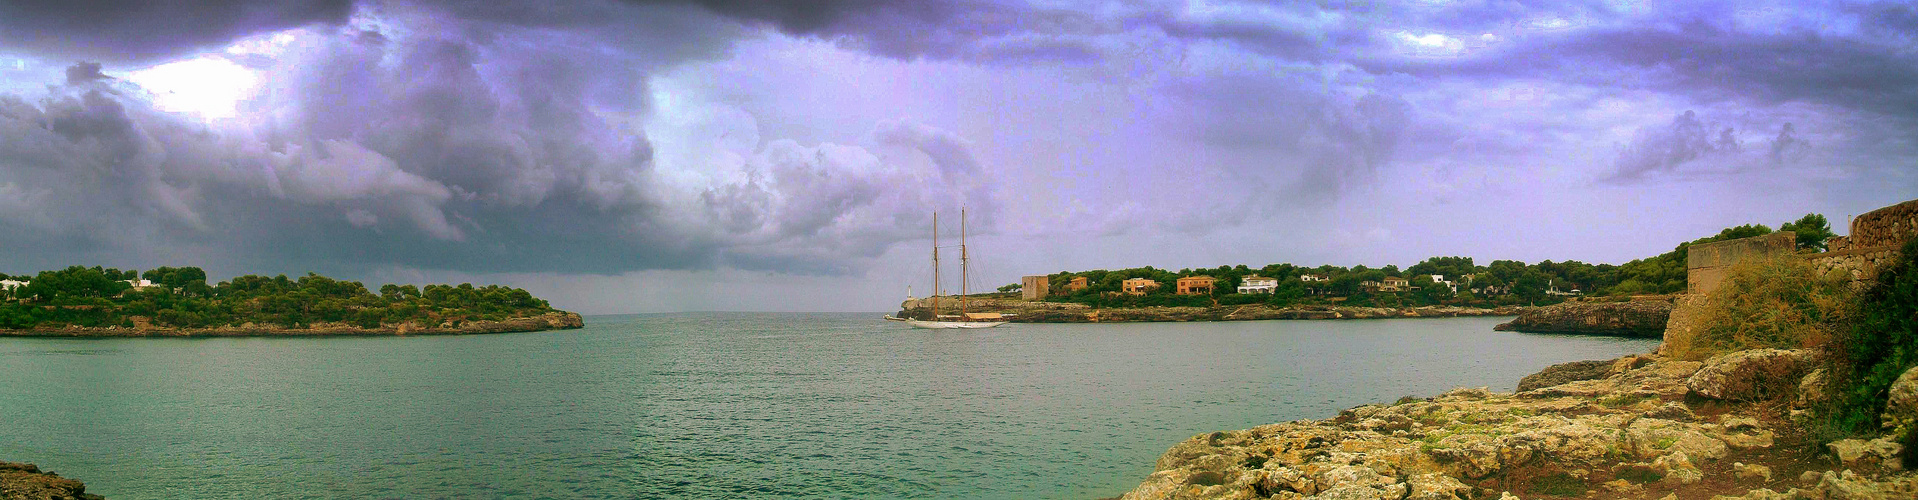 Marina y tormenta